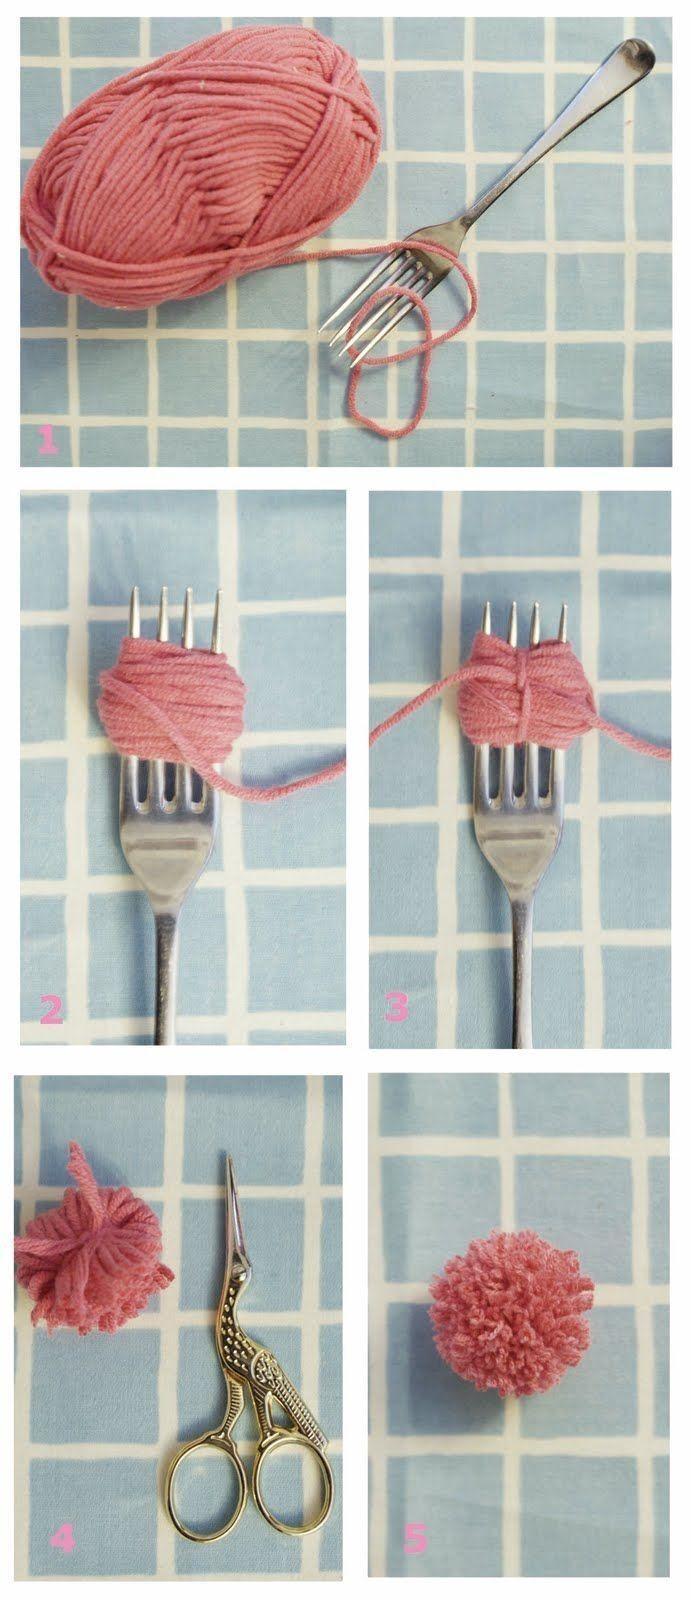 como hacer un pompon de lana paso a paso